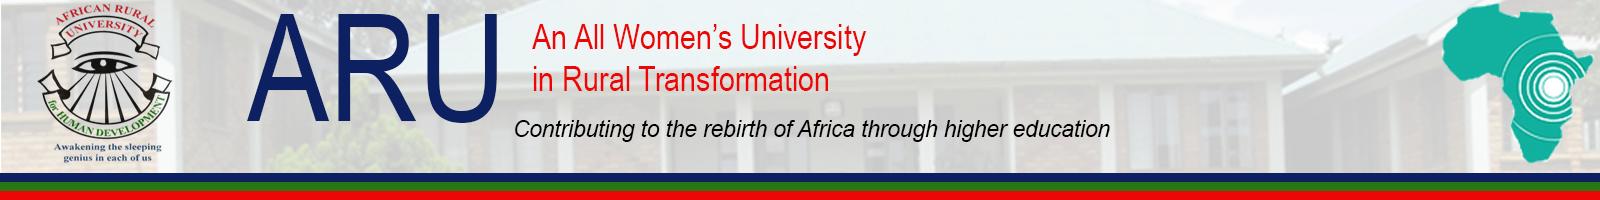 African Rural University-ARU